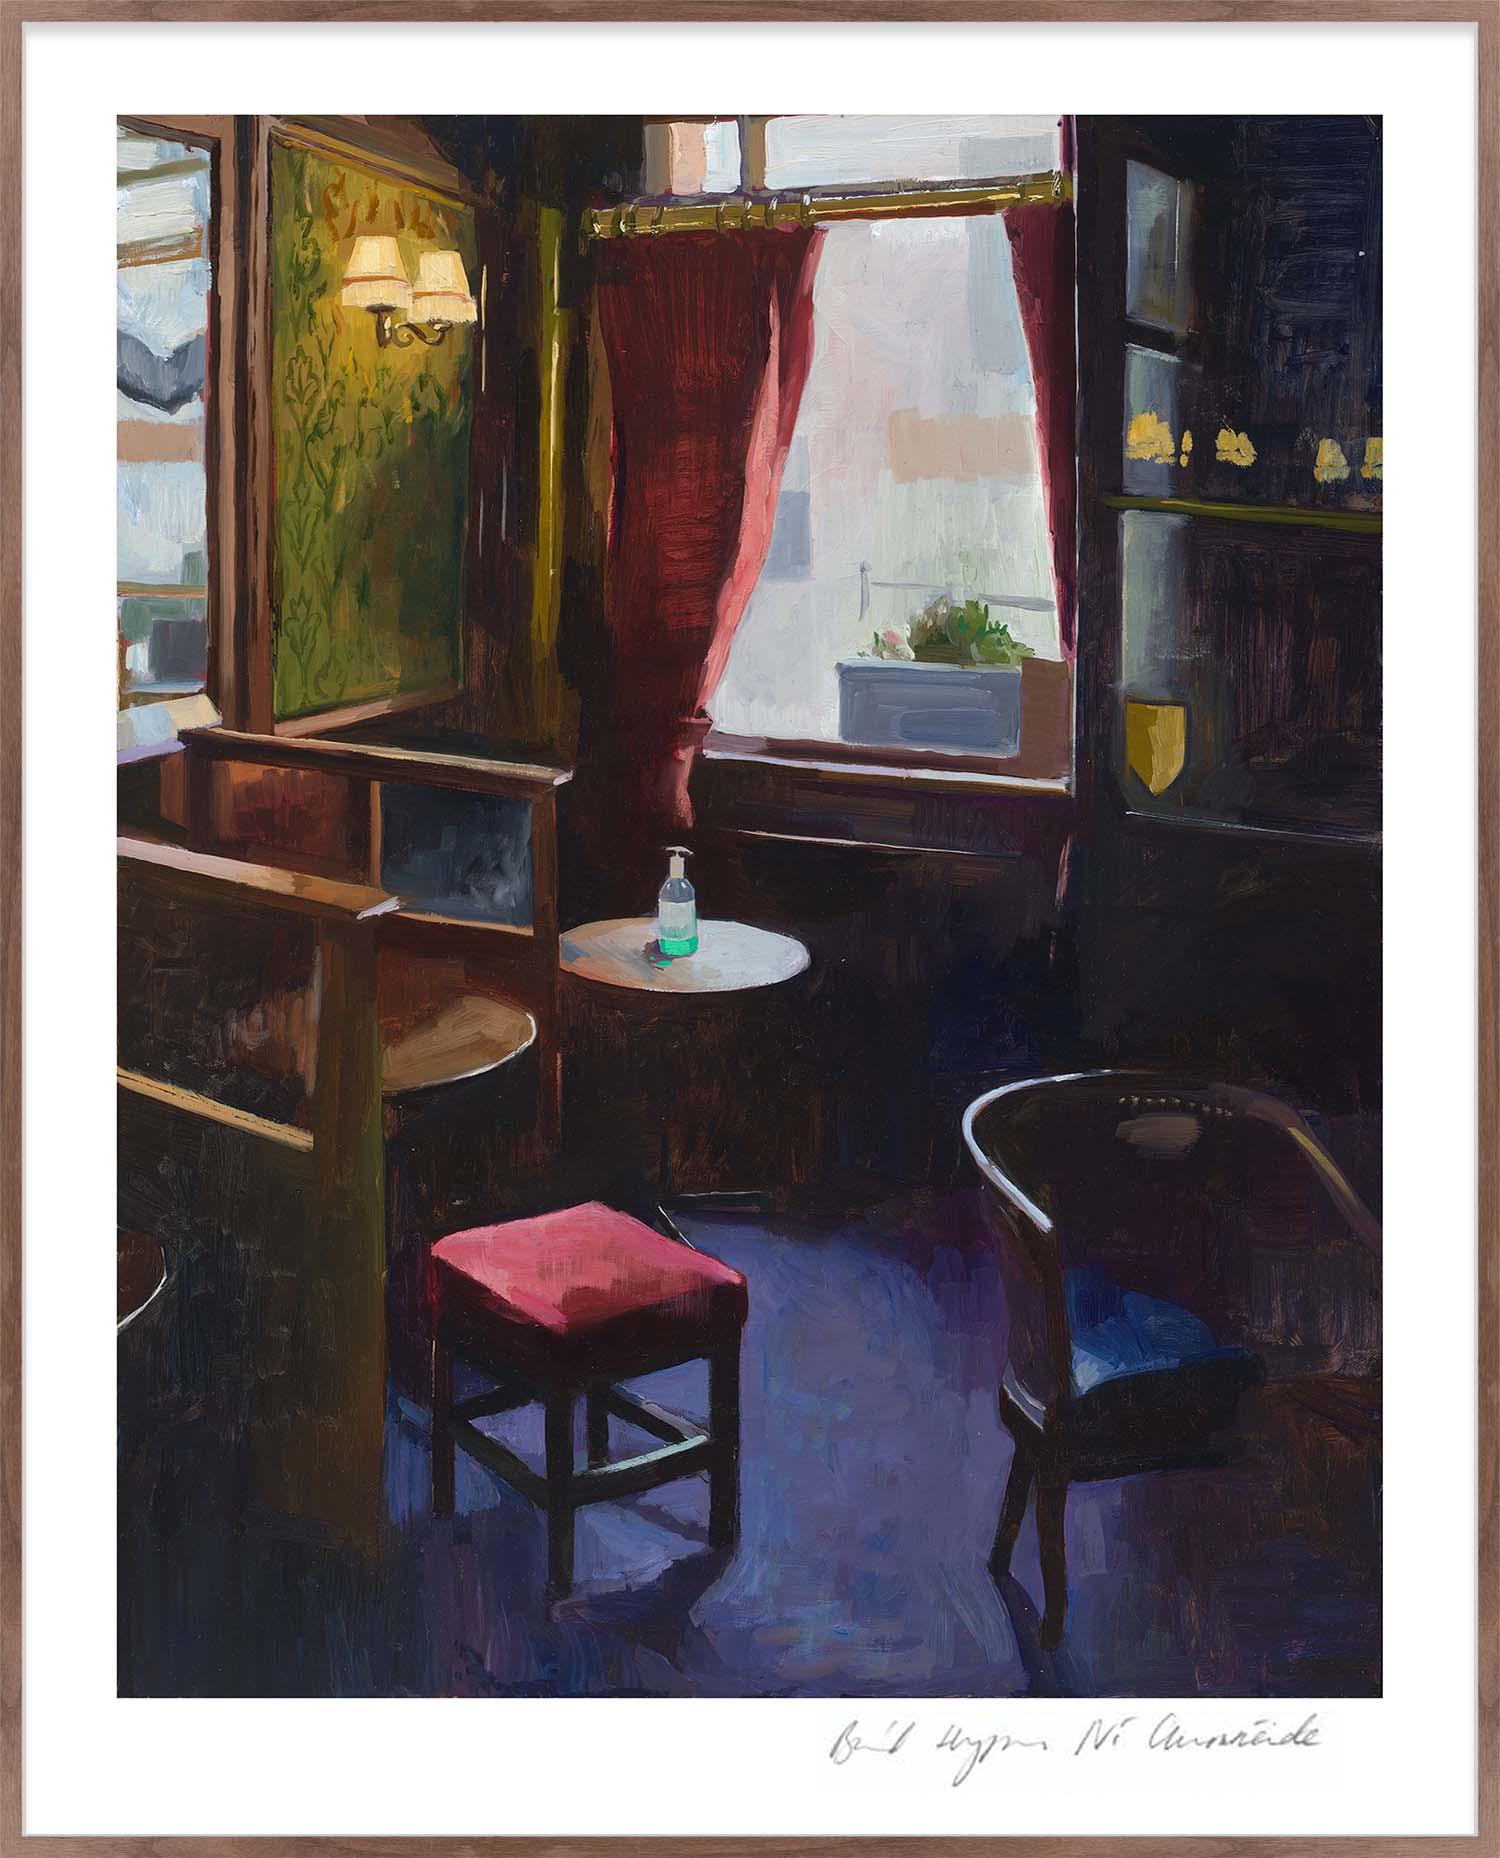 Hang Tough 'Pub Window' Slip Mounted in Walnut (Framing Only)